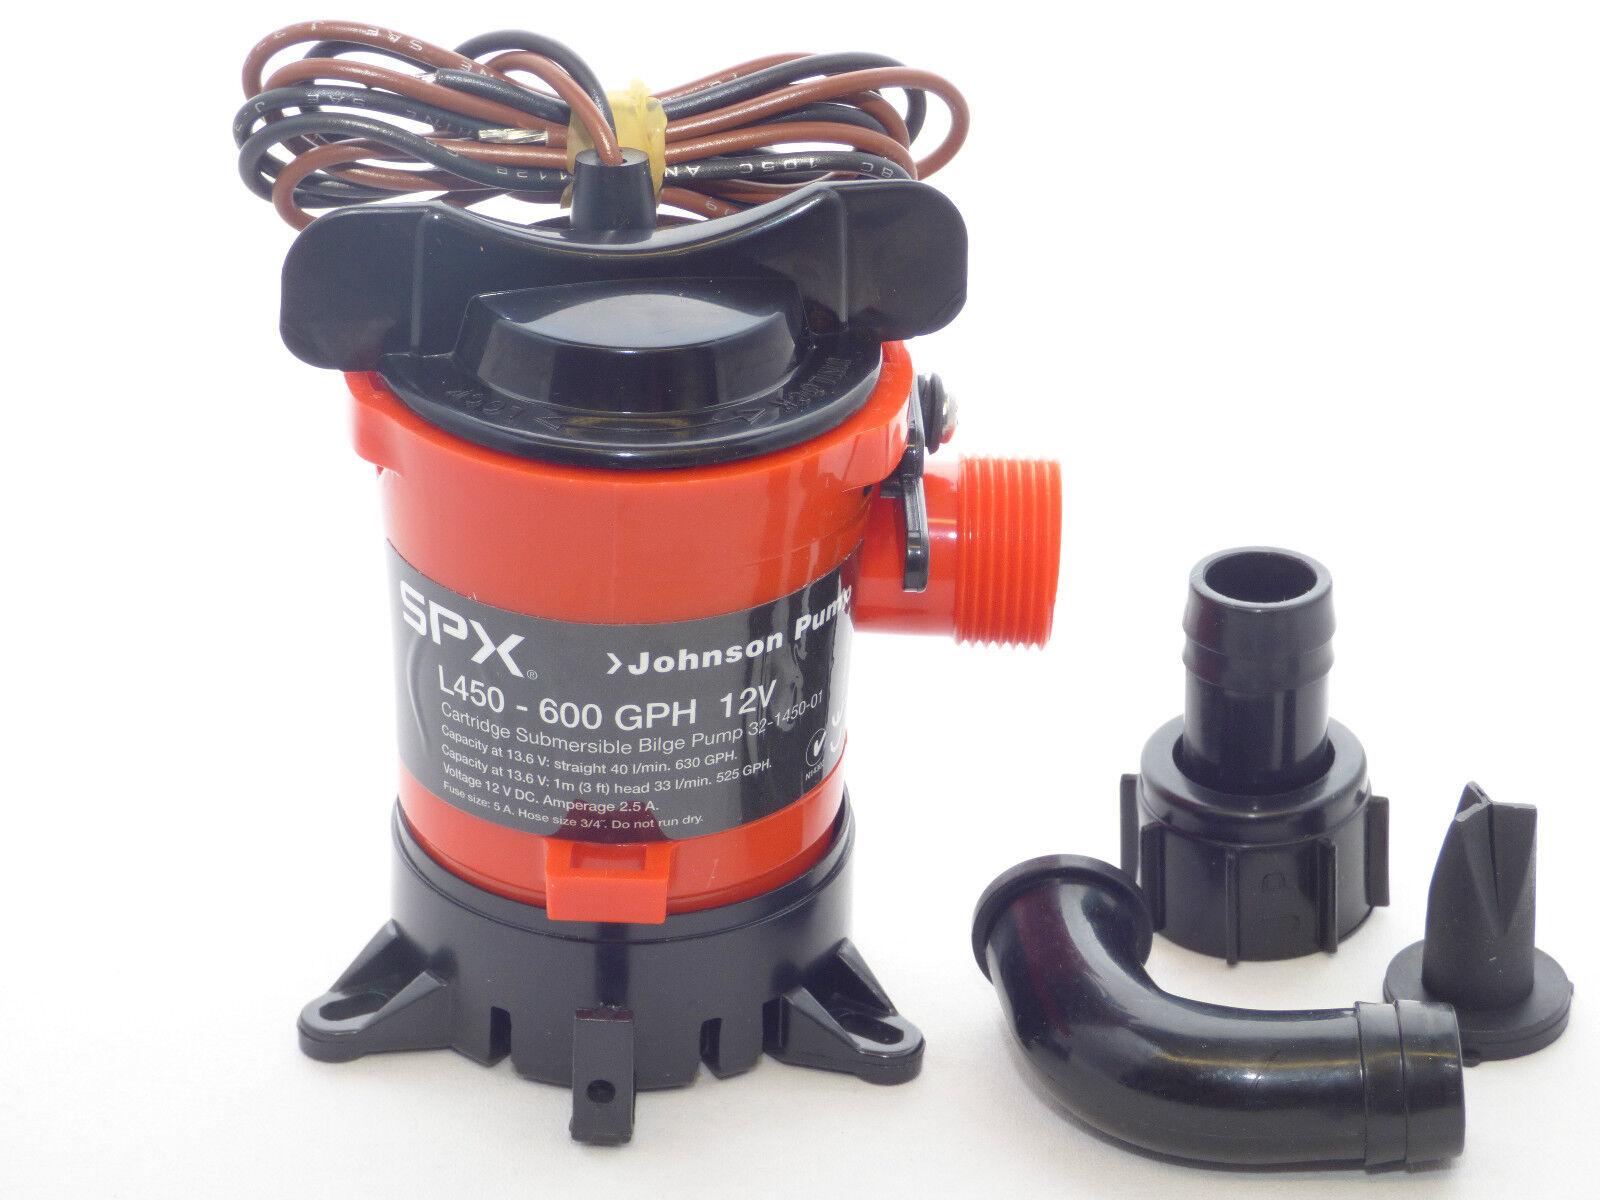 Bilgenpumpe JOHNSON PUMP L450 - Wasserpumpe L 750  Lenzpumpe Wasserpumpe - Tauchpumpe a6102f